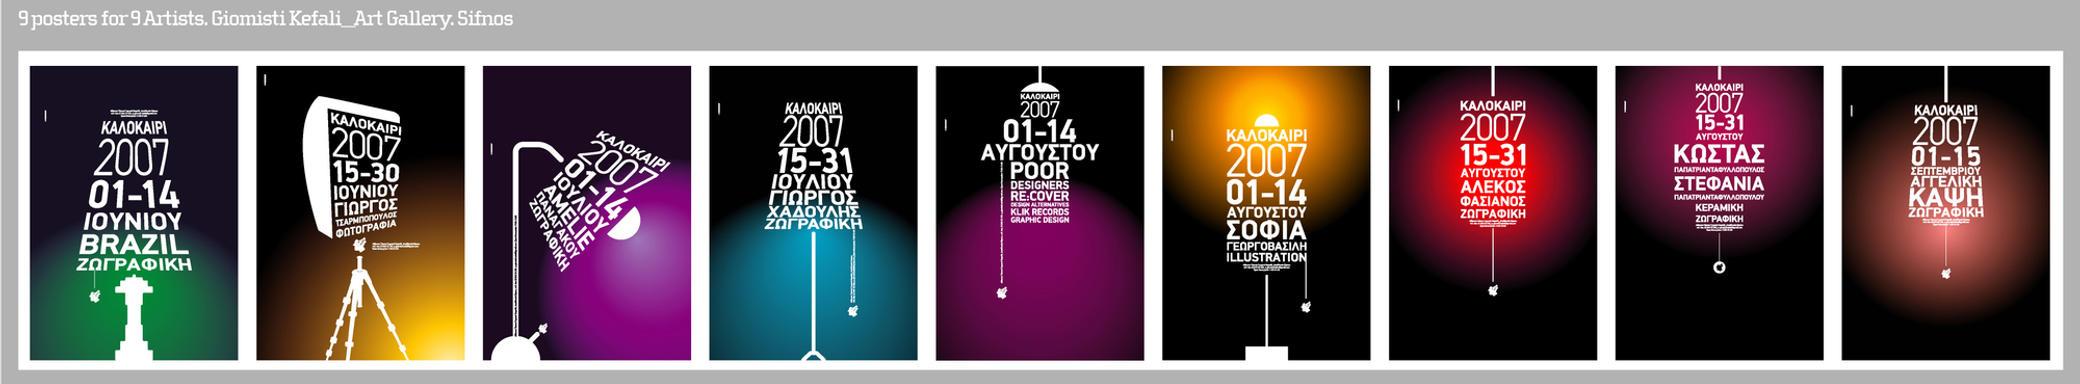 Giomisti_Kefali_9 Posters by PoorDesigners